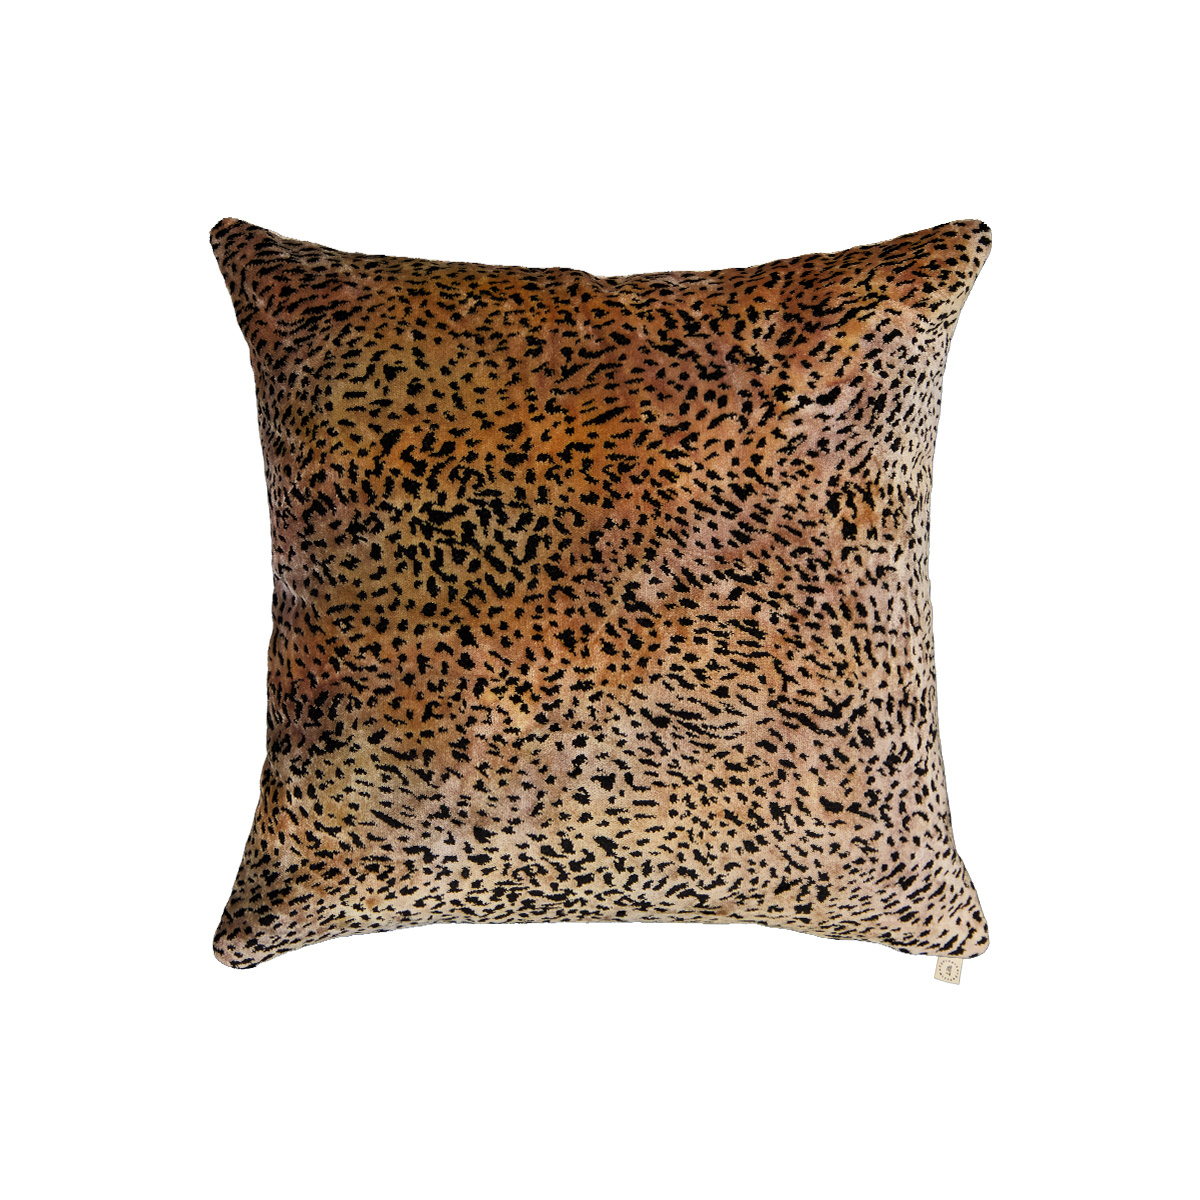 Coussin Carino carré en velours Roseanna jacquard léopard